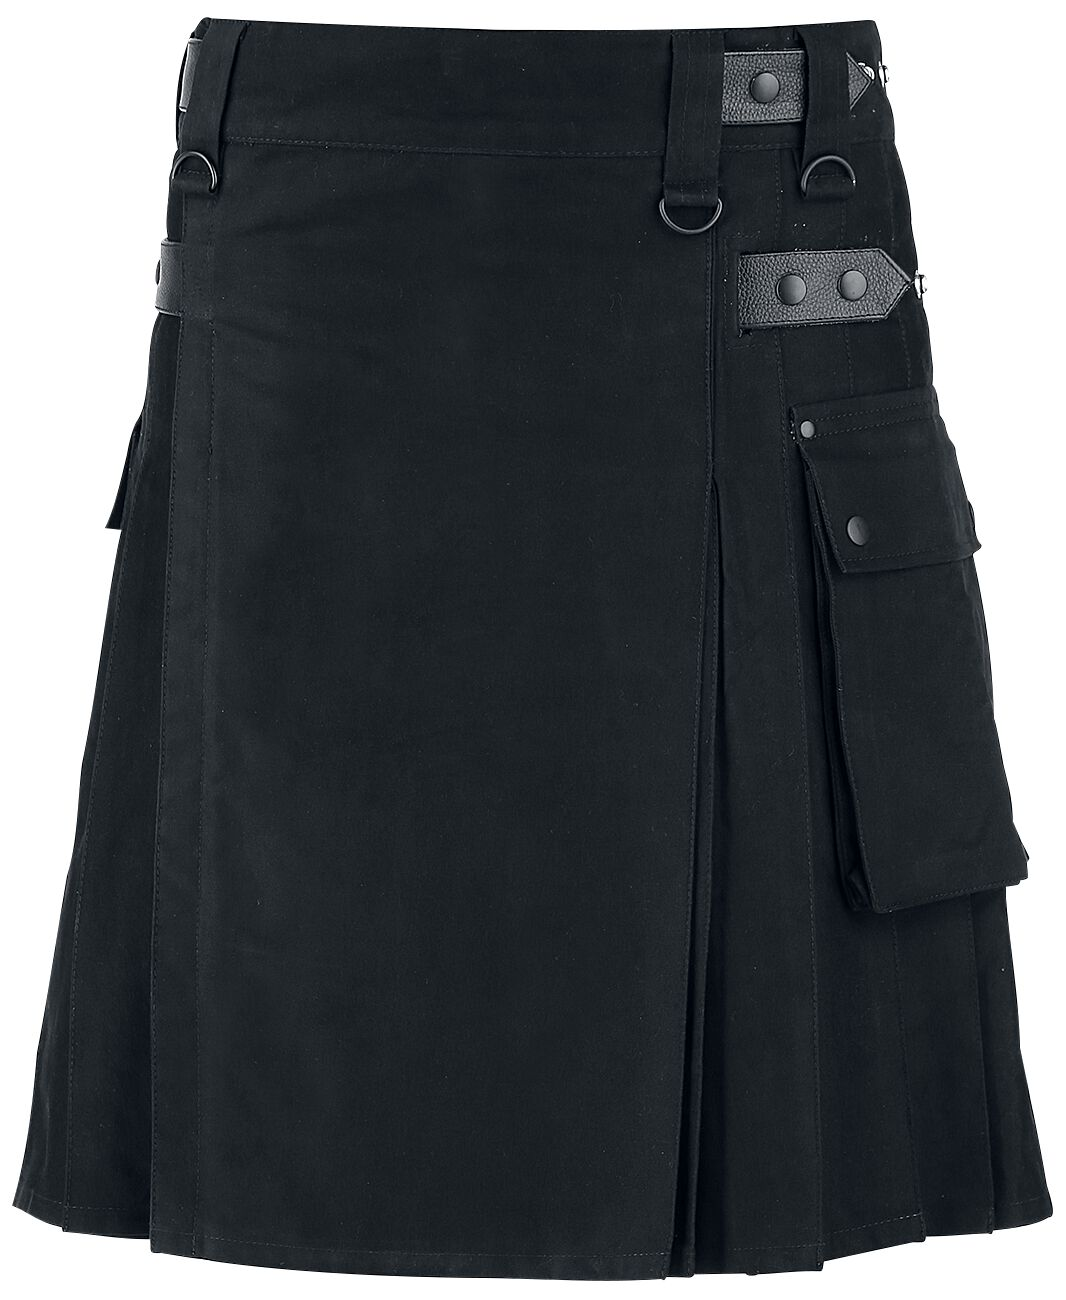 Black Premium by EMP Kilt Medium-length skirt black